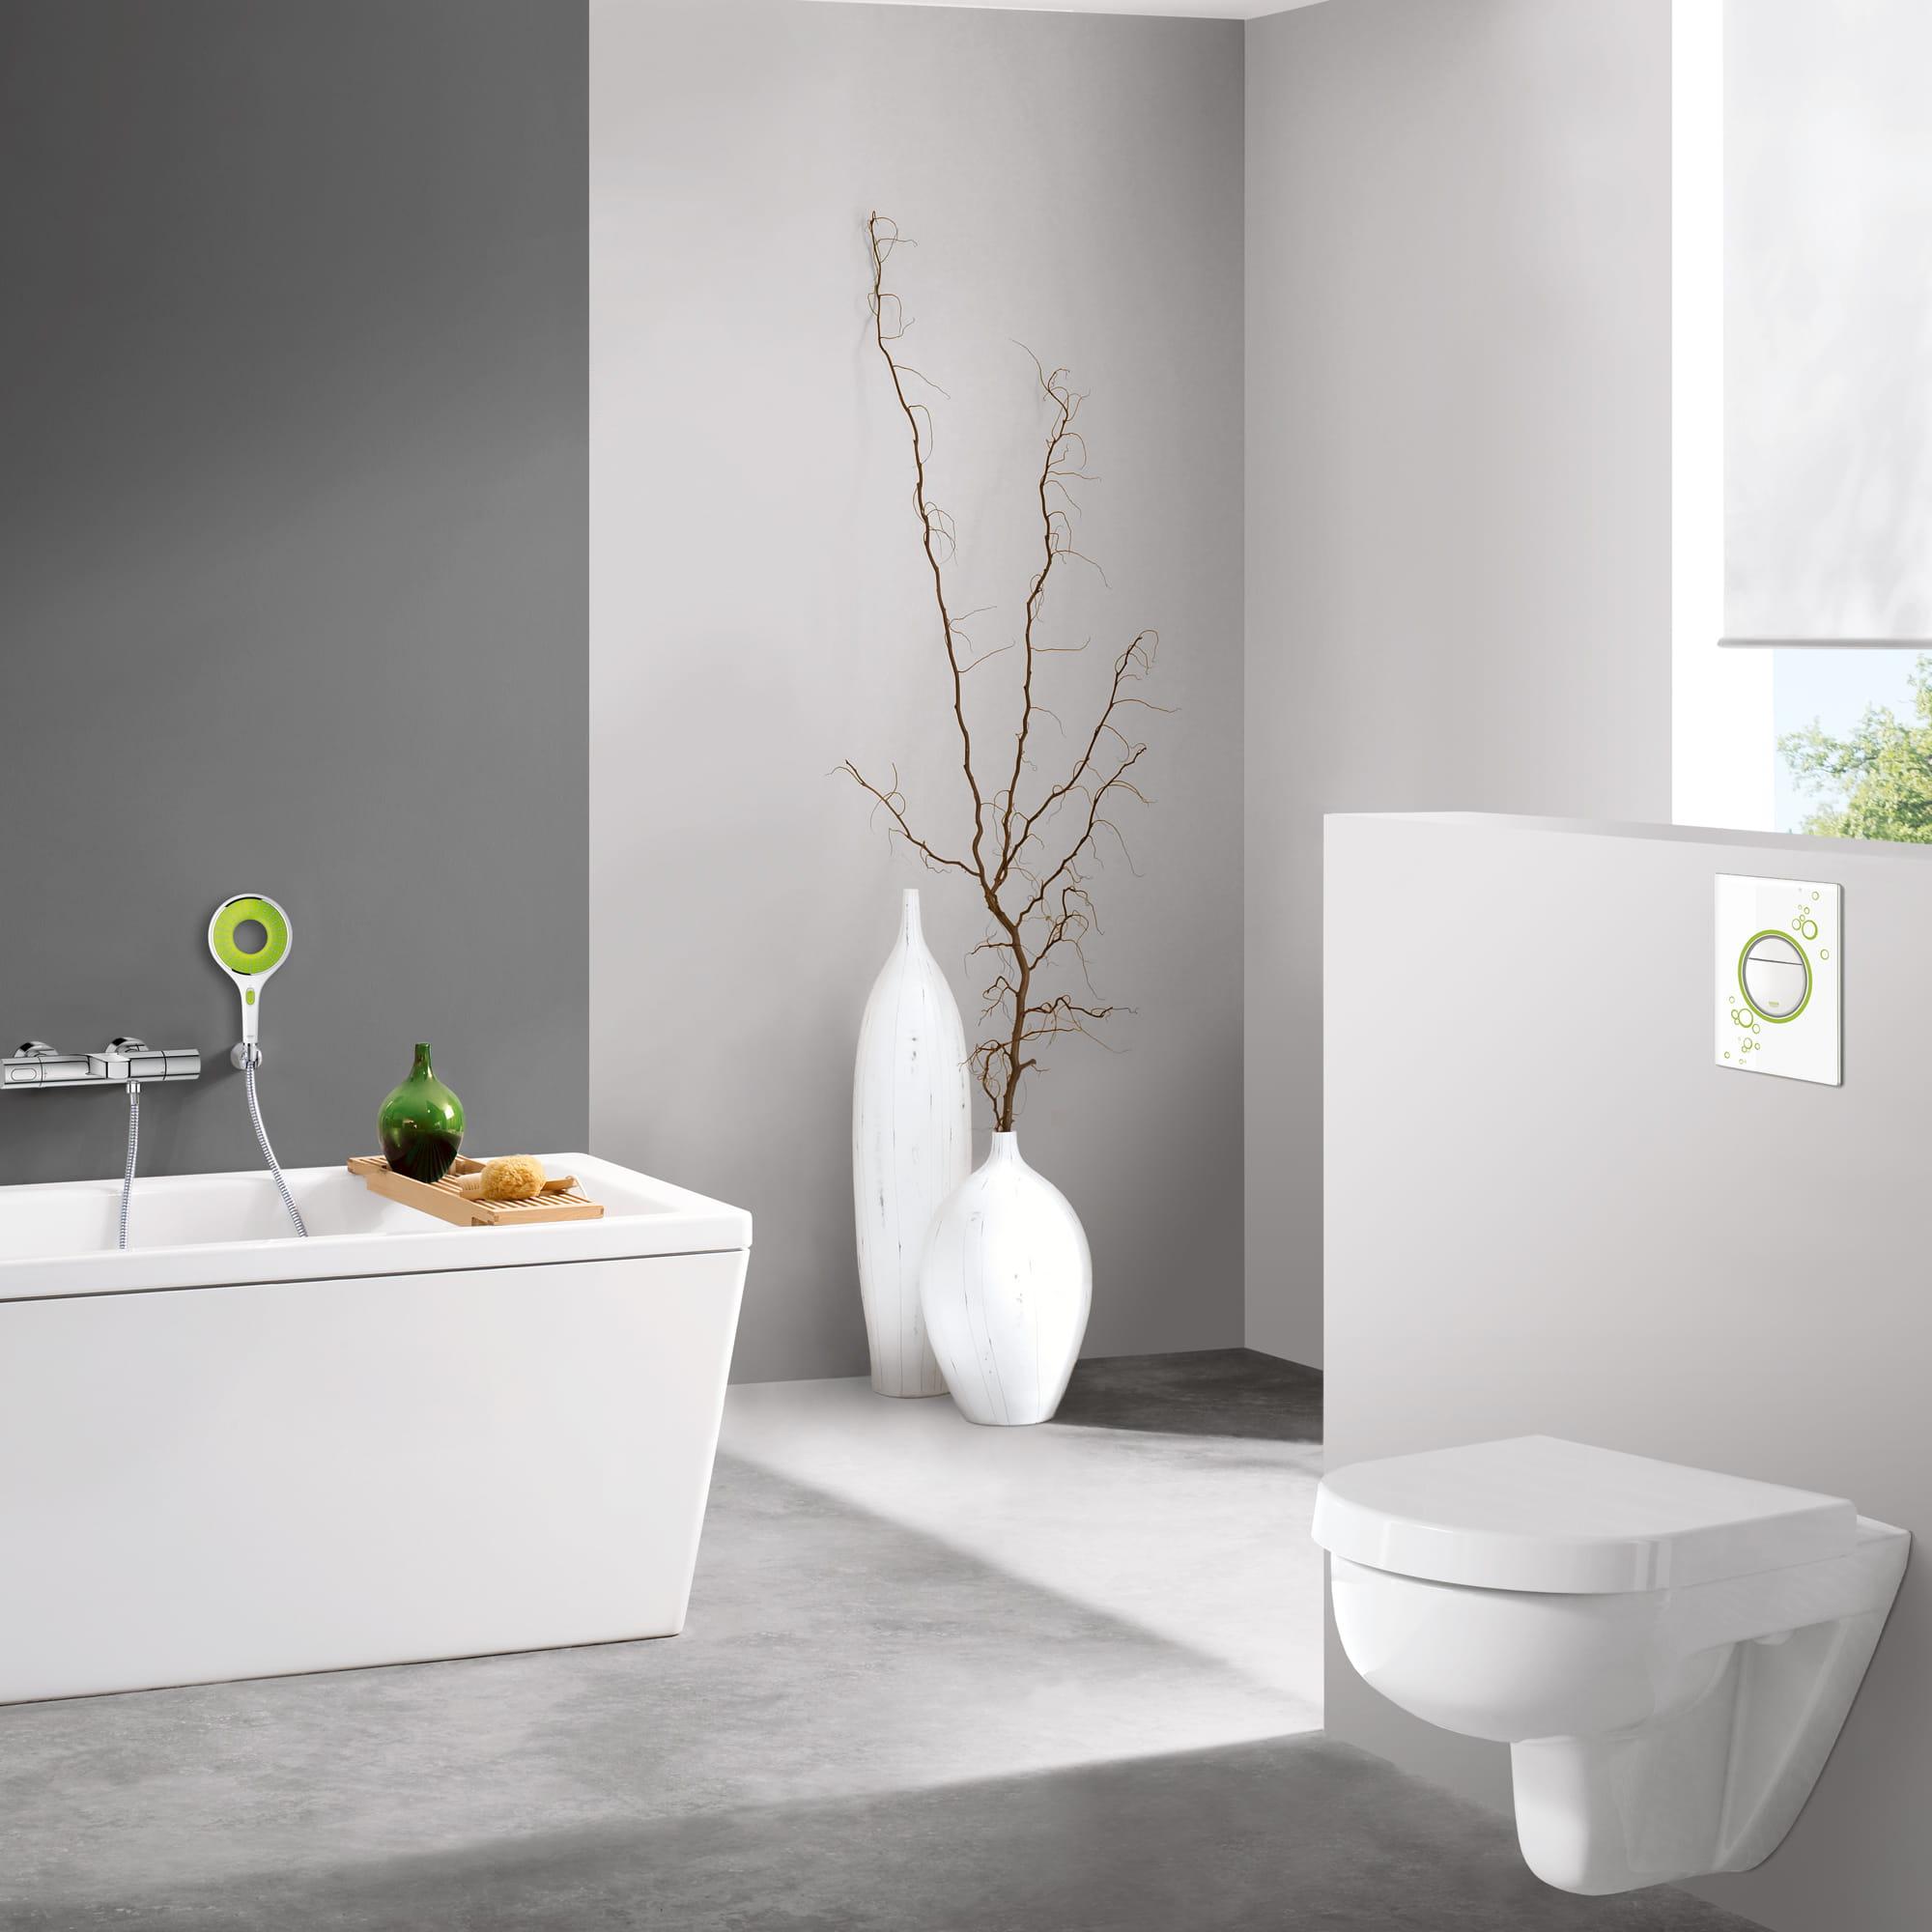 GROHE Toilettes aux accents verts